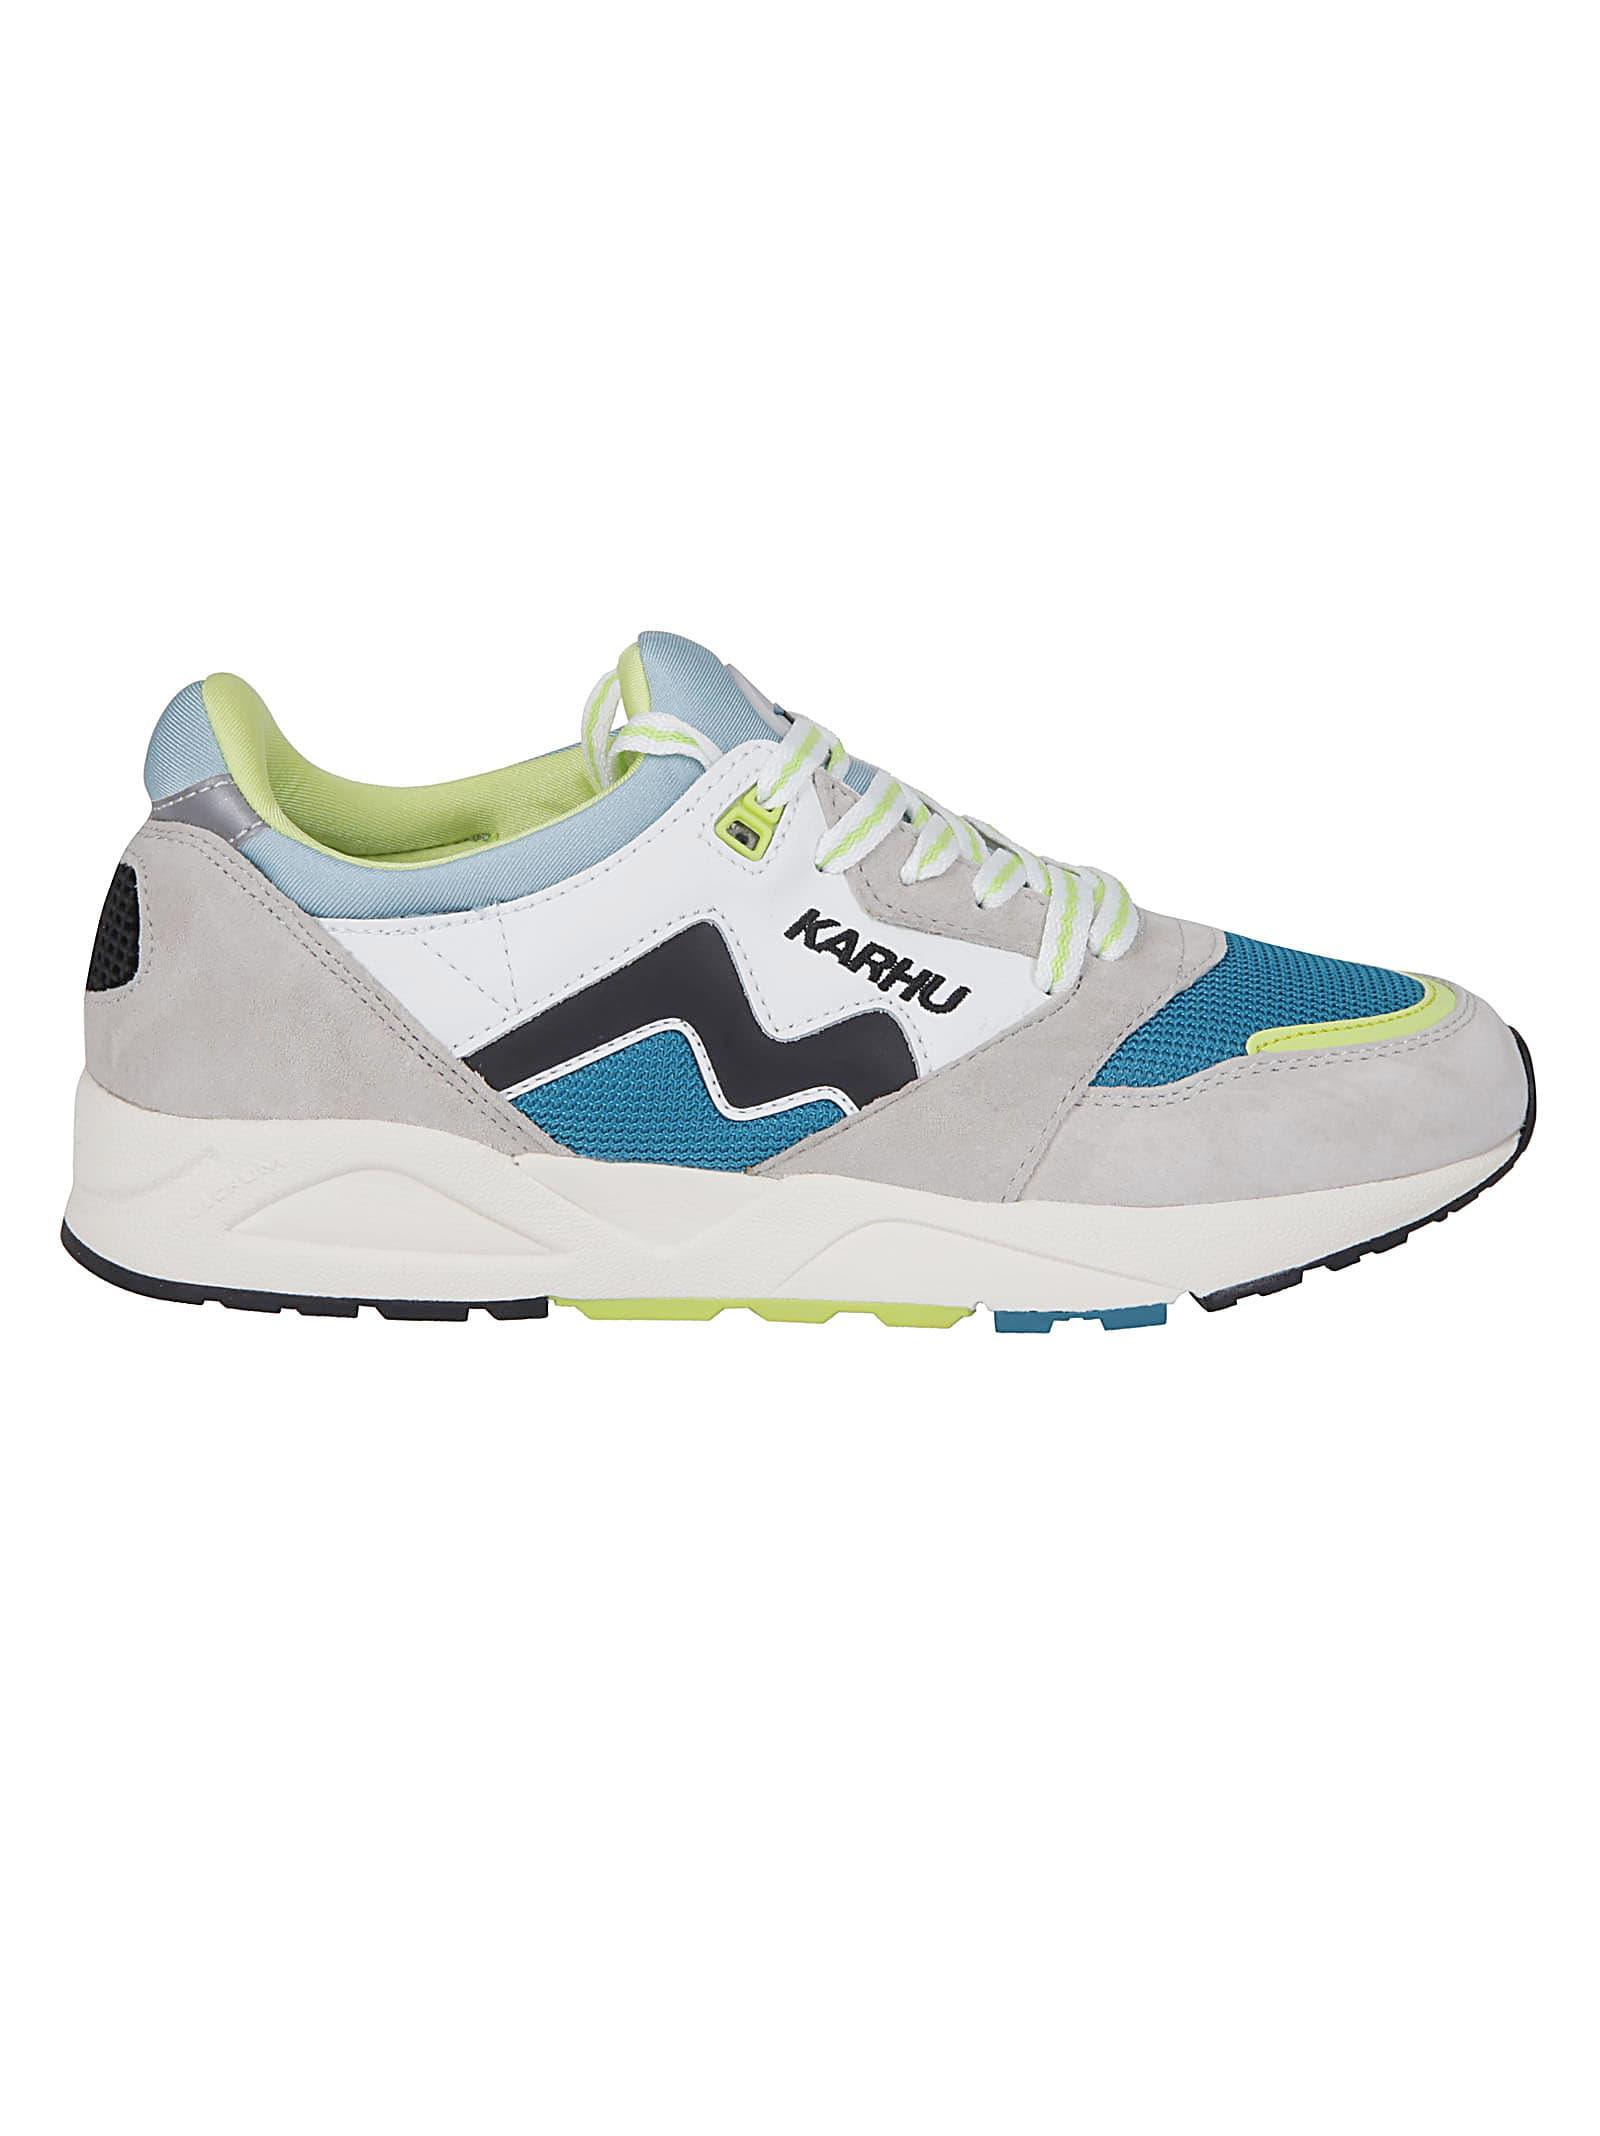 factory price 3fc96 86f7e Karhu Sneakers